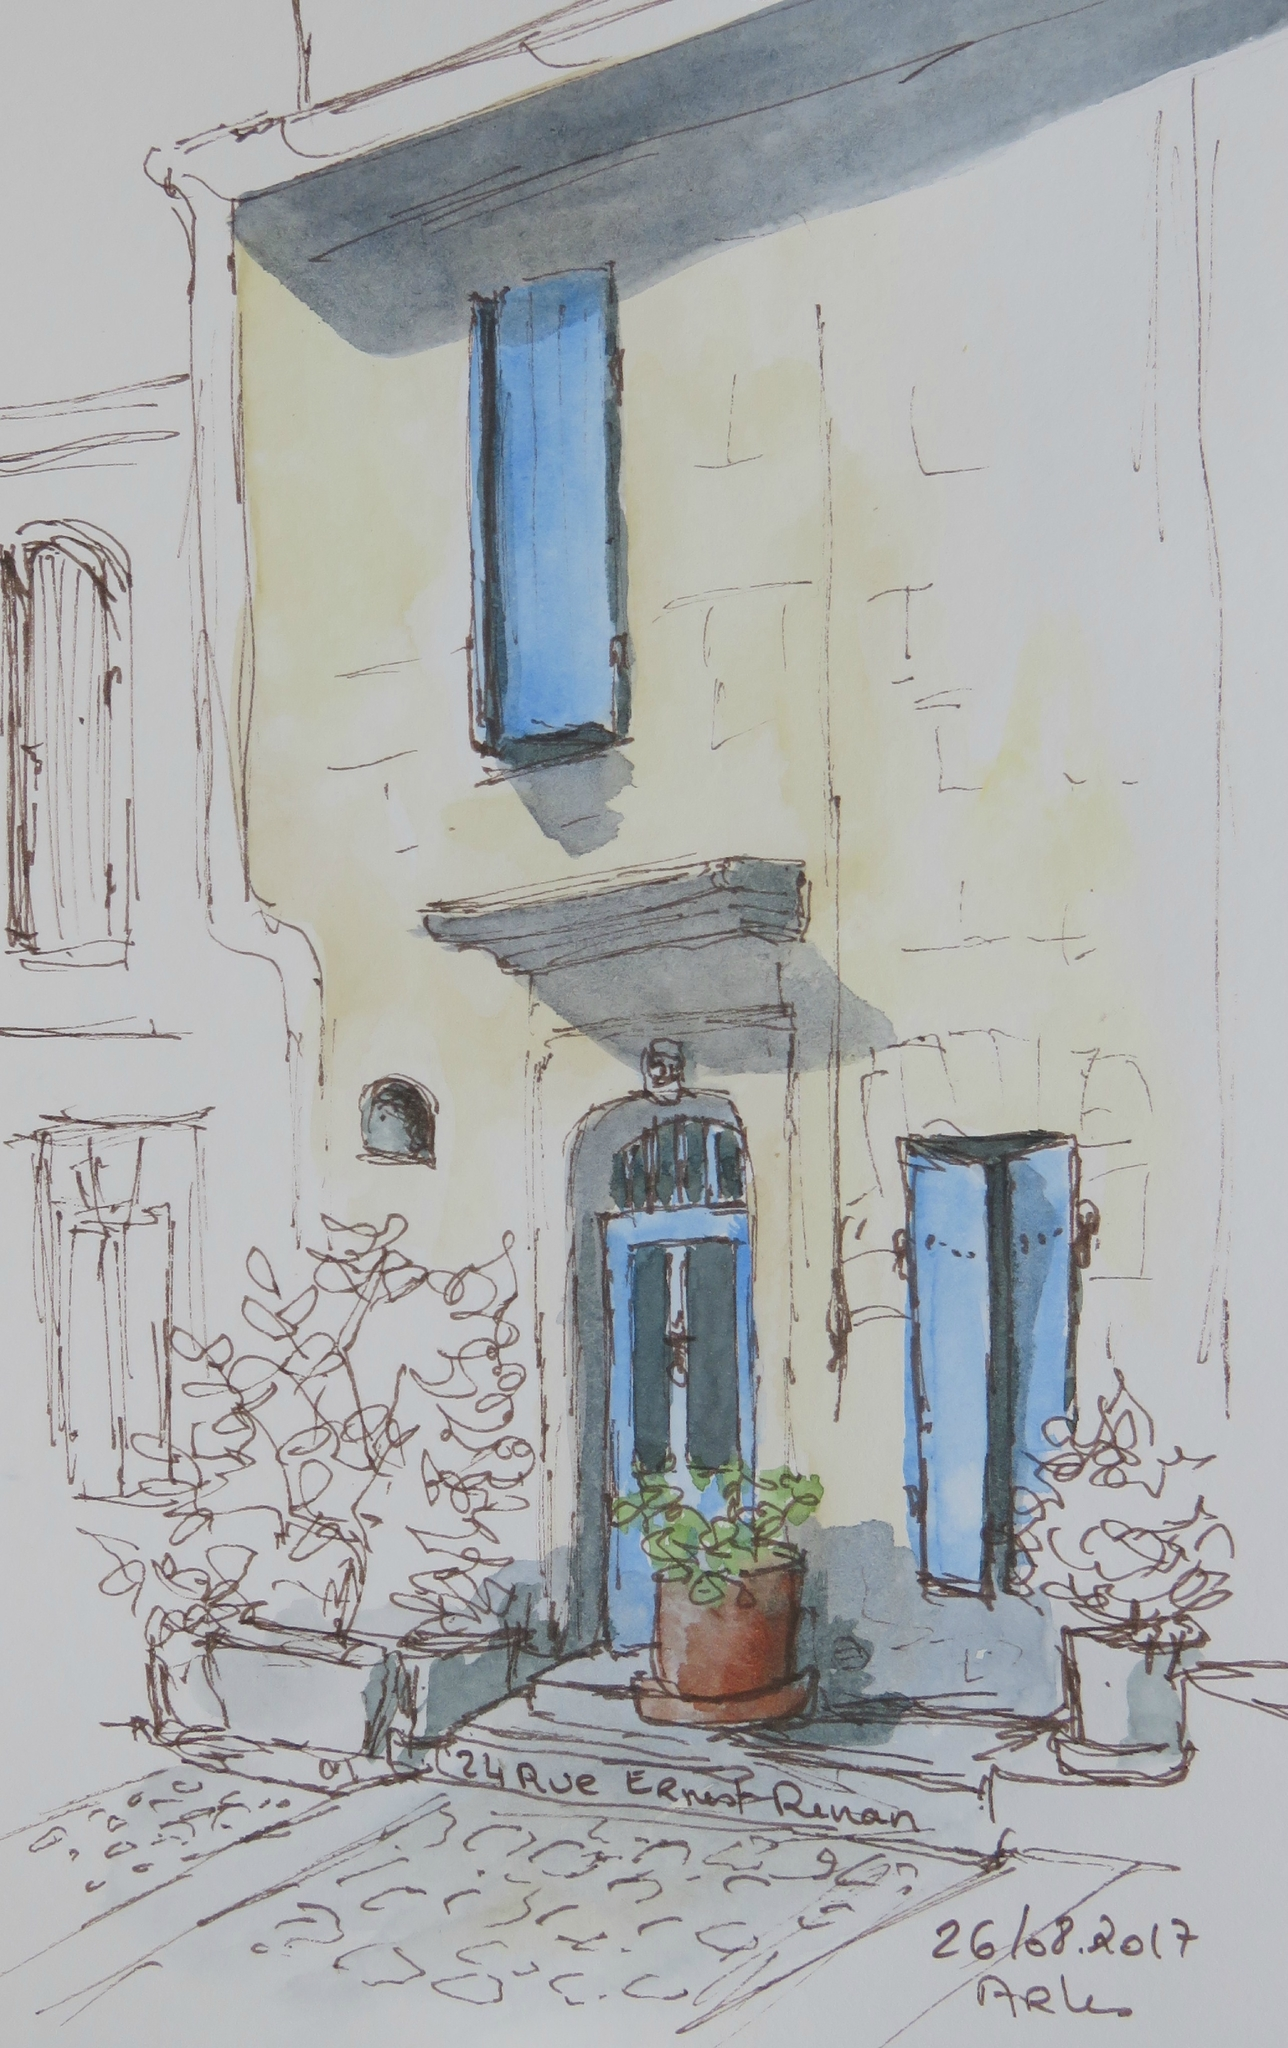 13 - Arles, 24 rue Ernest Renan